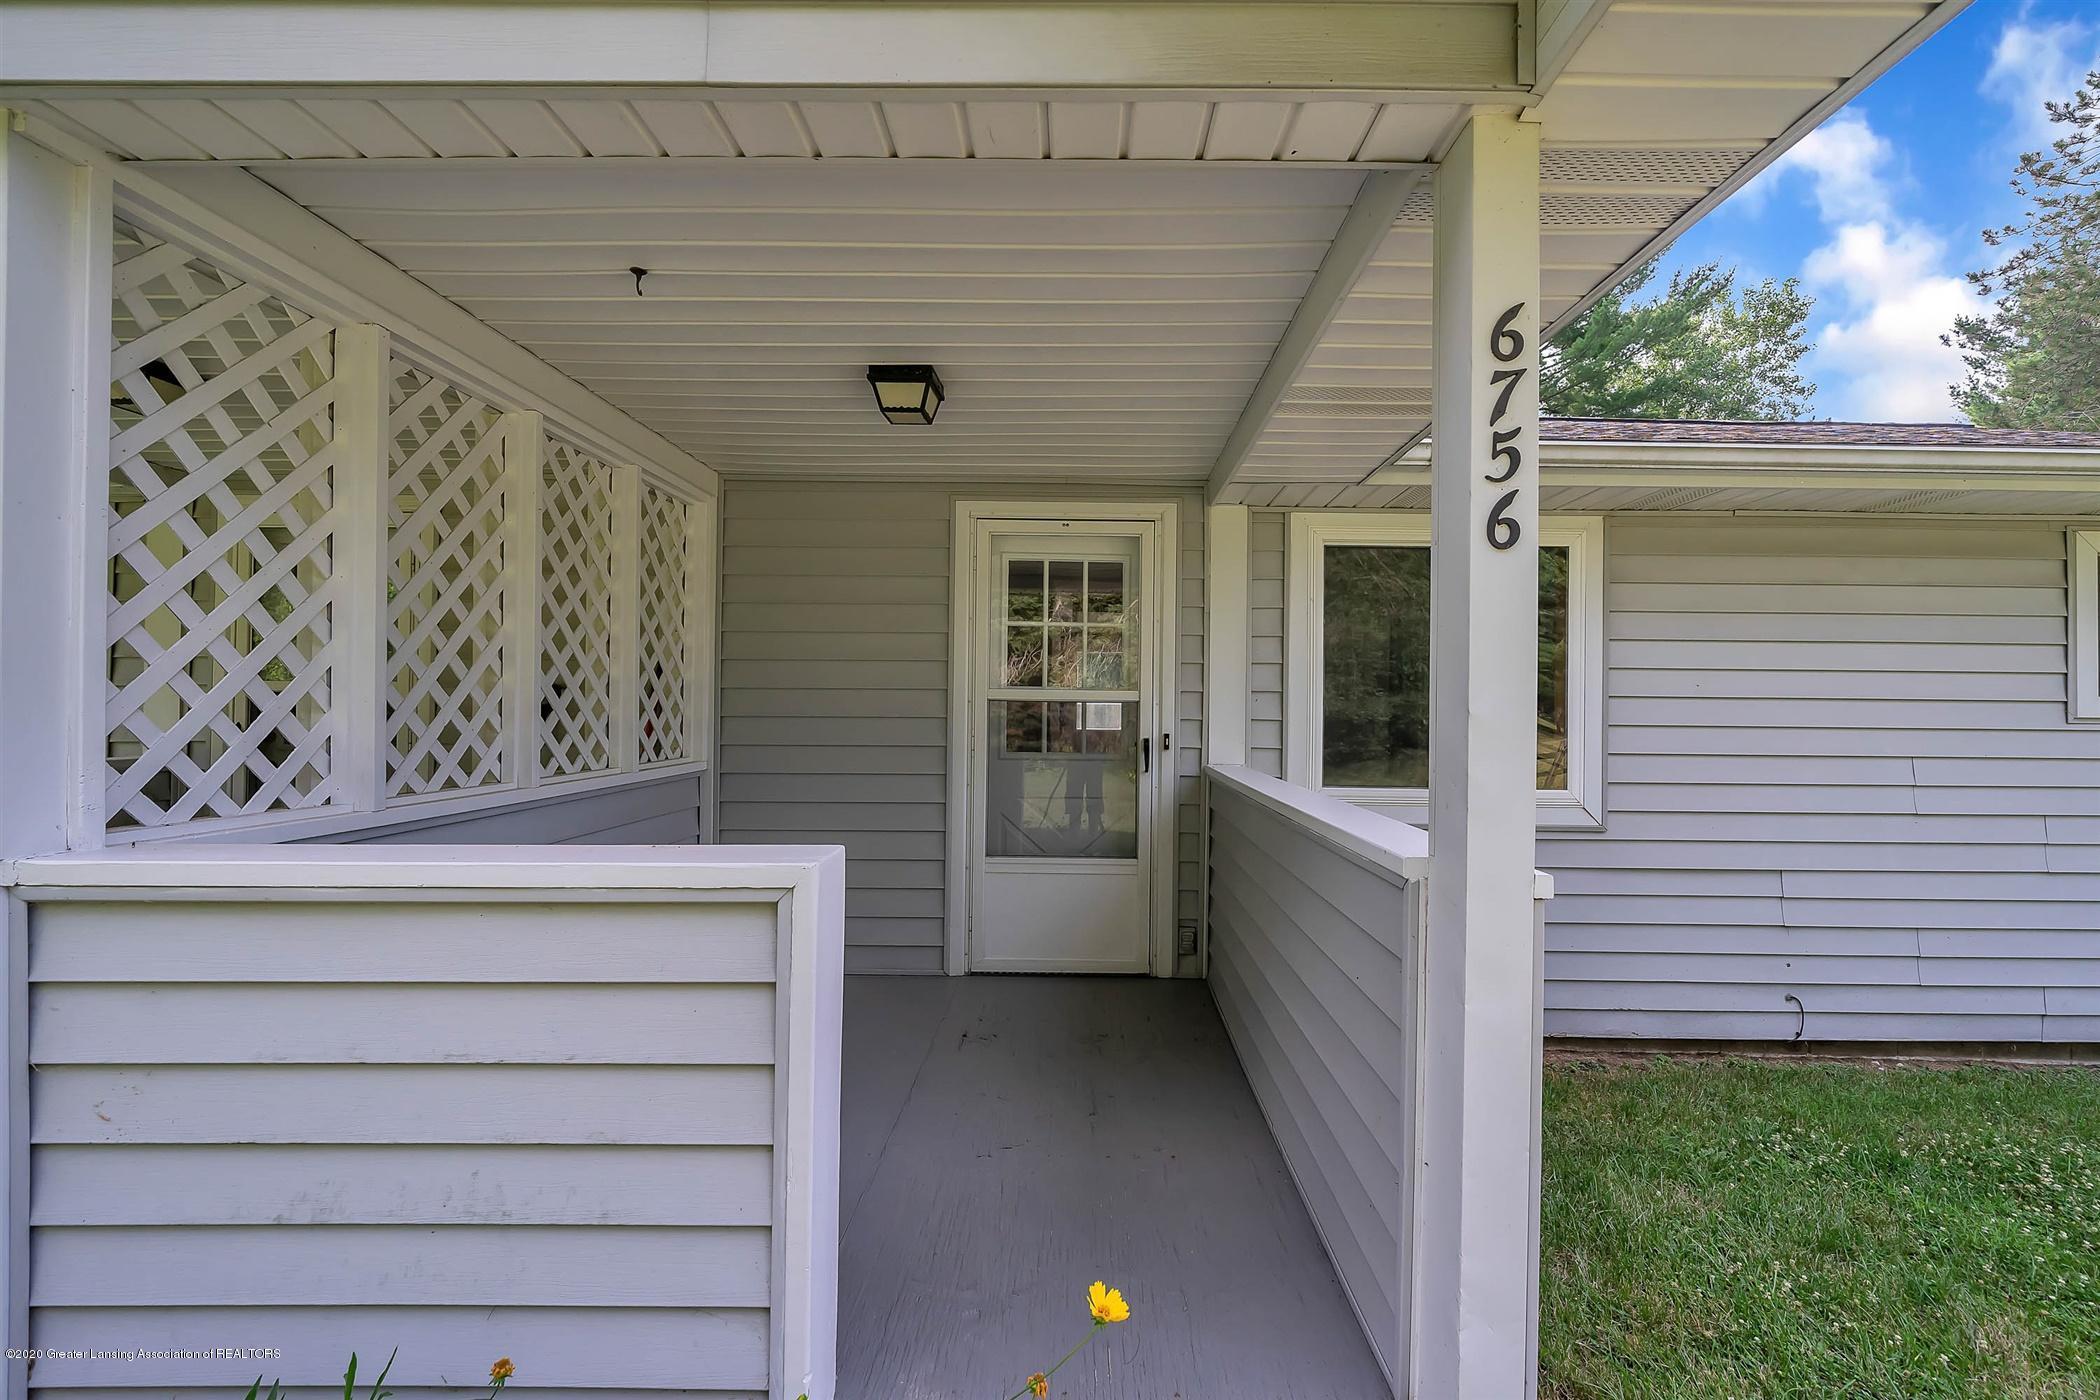 6750 W Lovejoy Rd - (20) 6756 Lovejoy Front Porch - 20